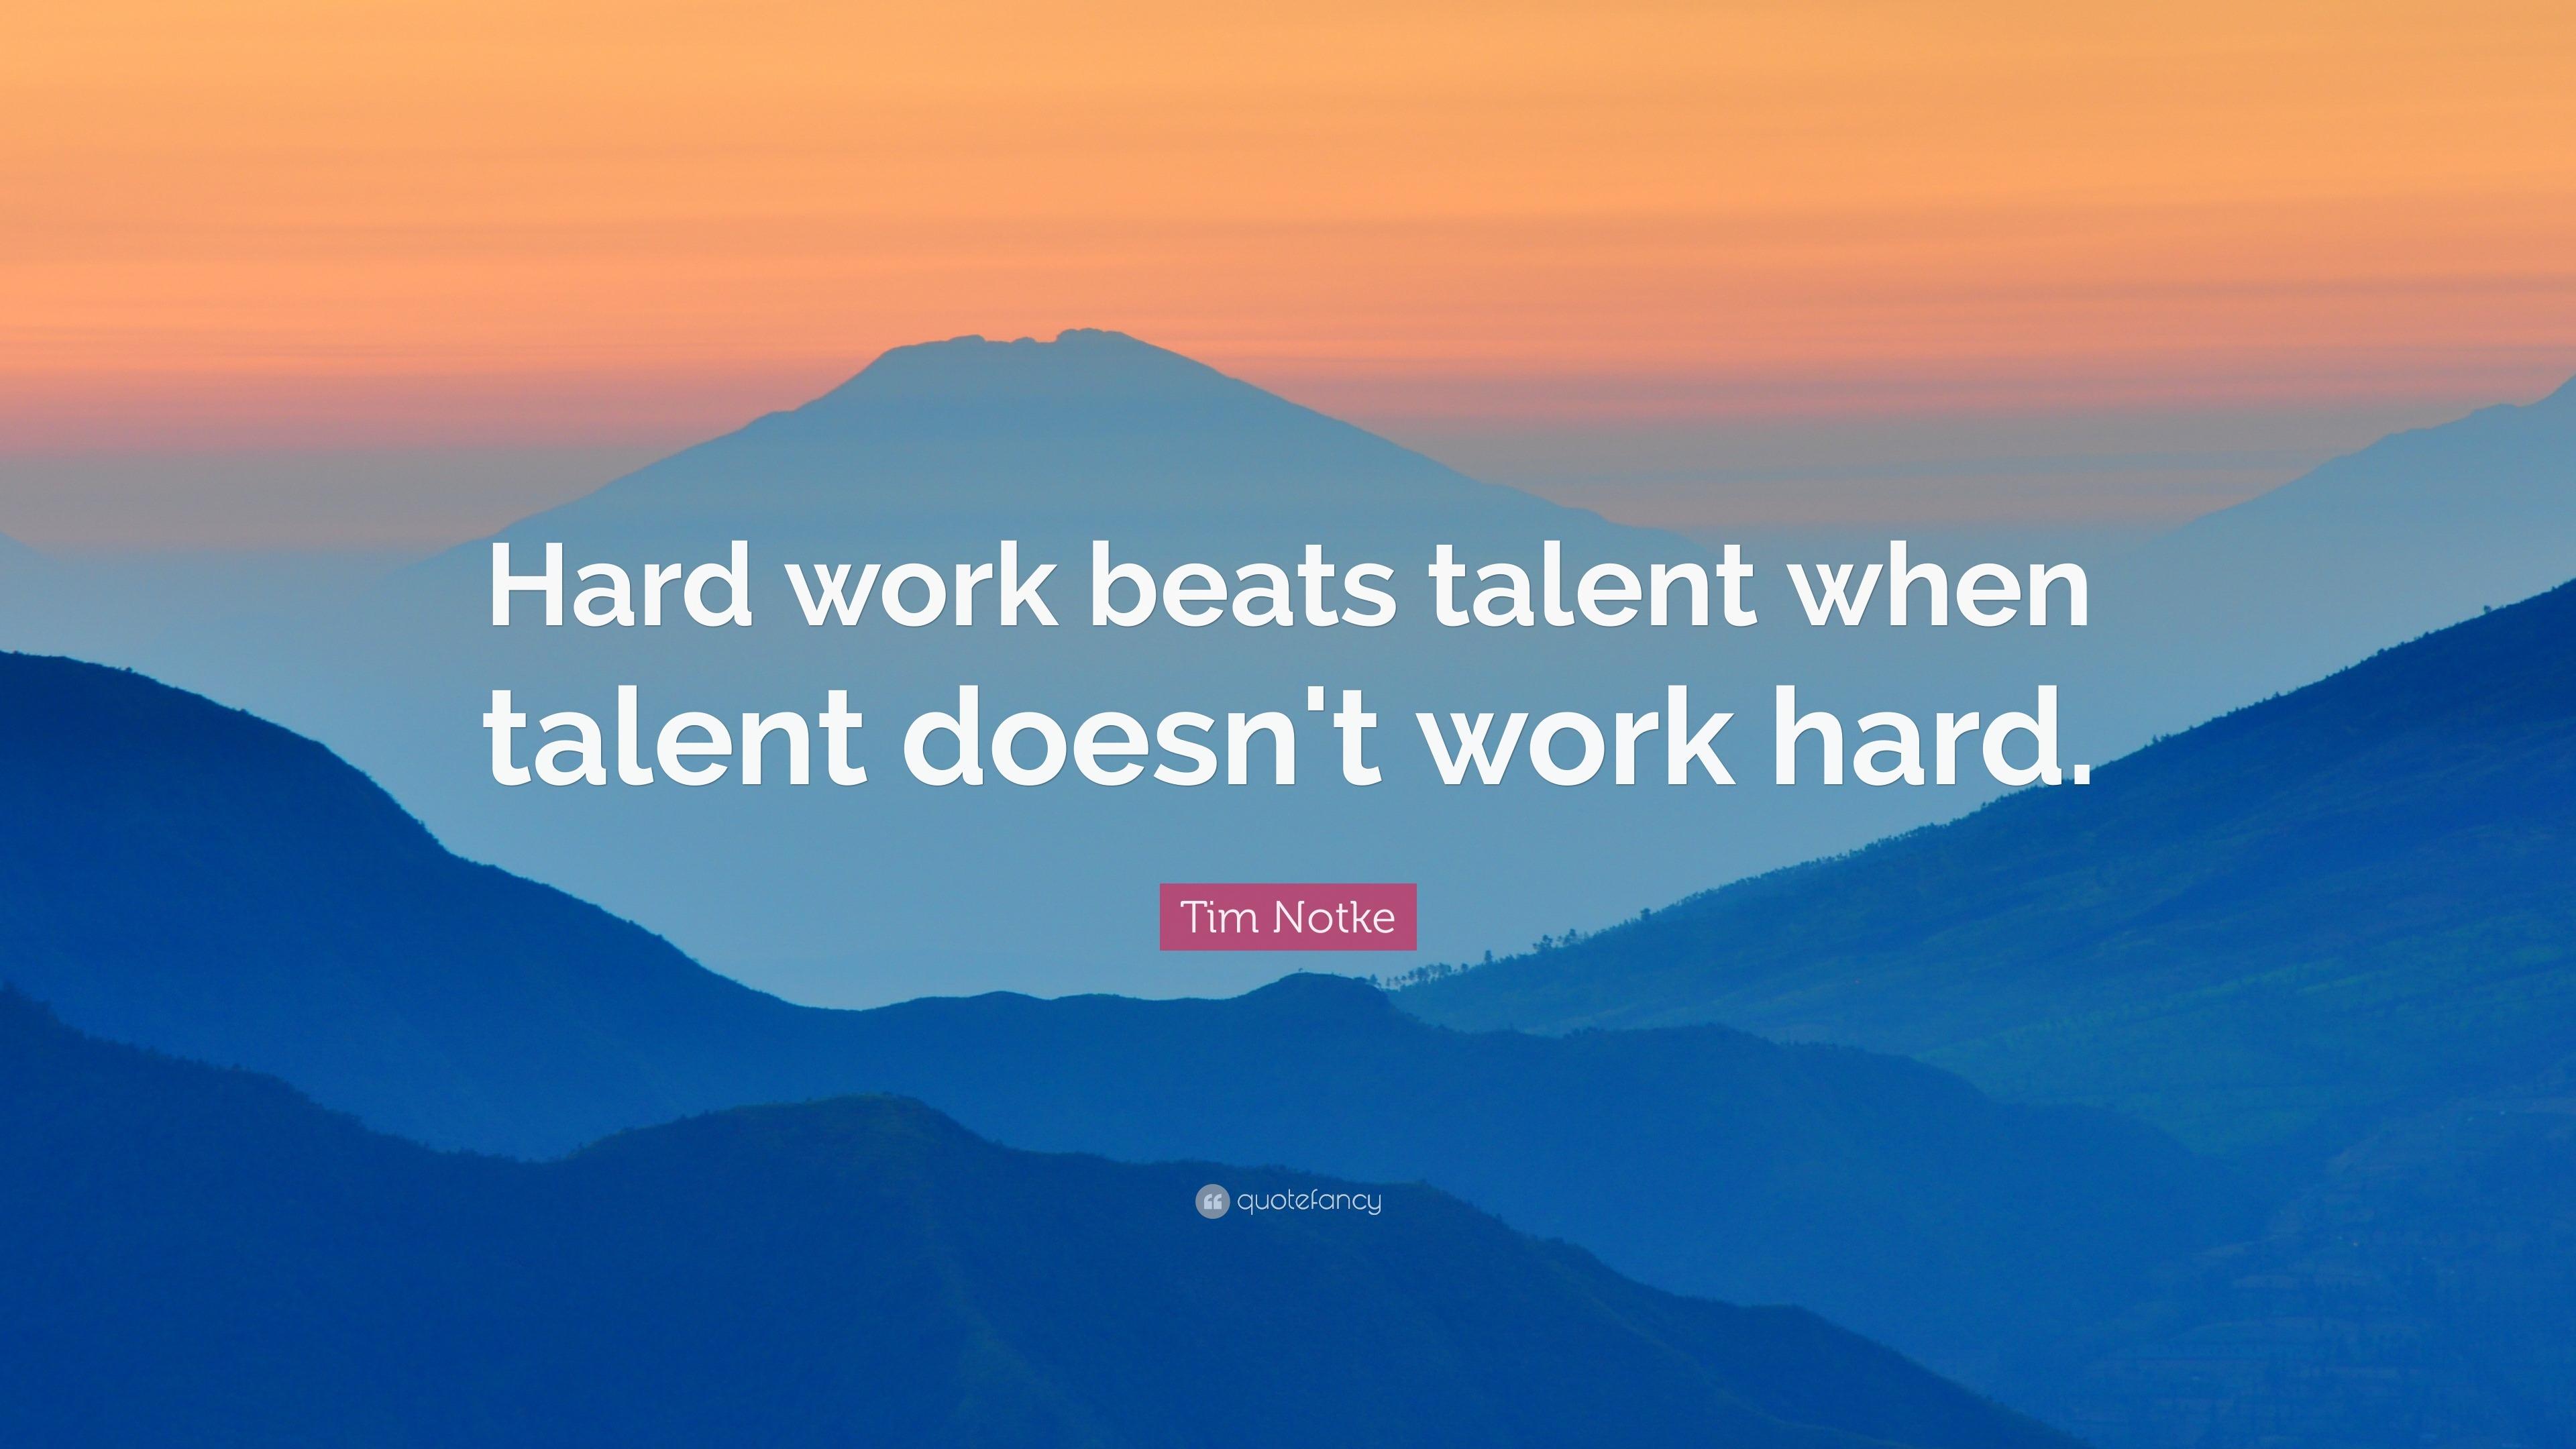 Hard Work Beats Talent Quote Wallpaper Tim Notke Quote Hard Work Beats Talent When Talent Doesn